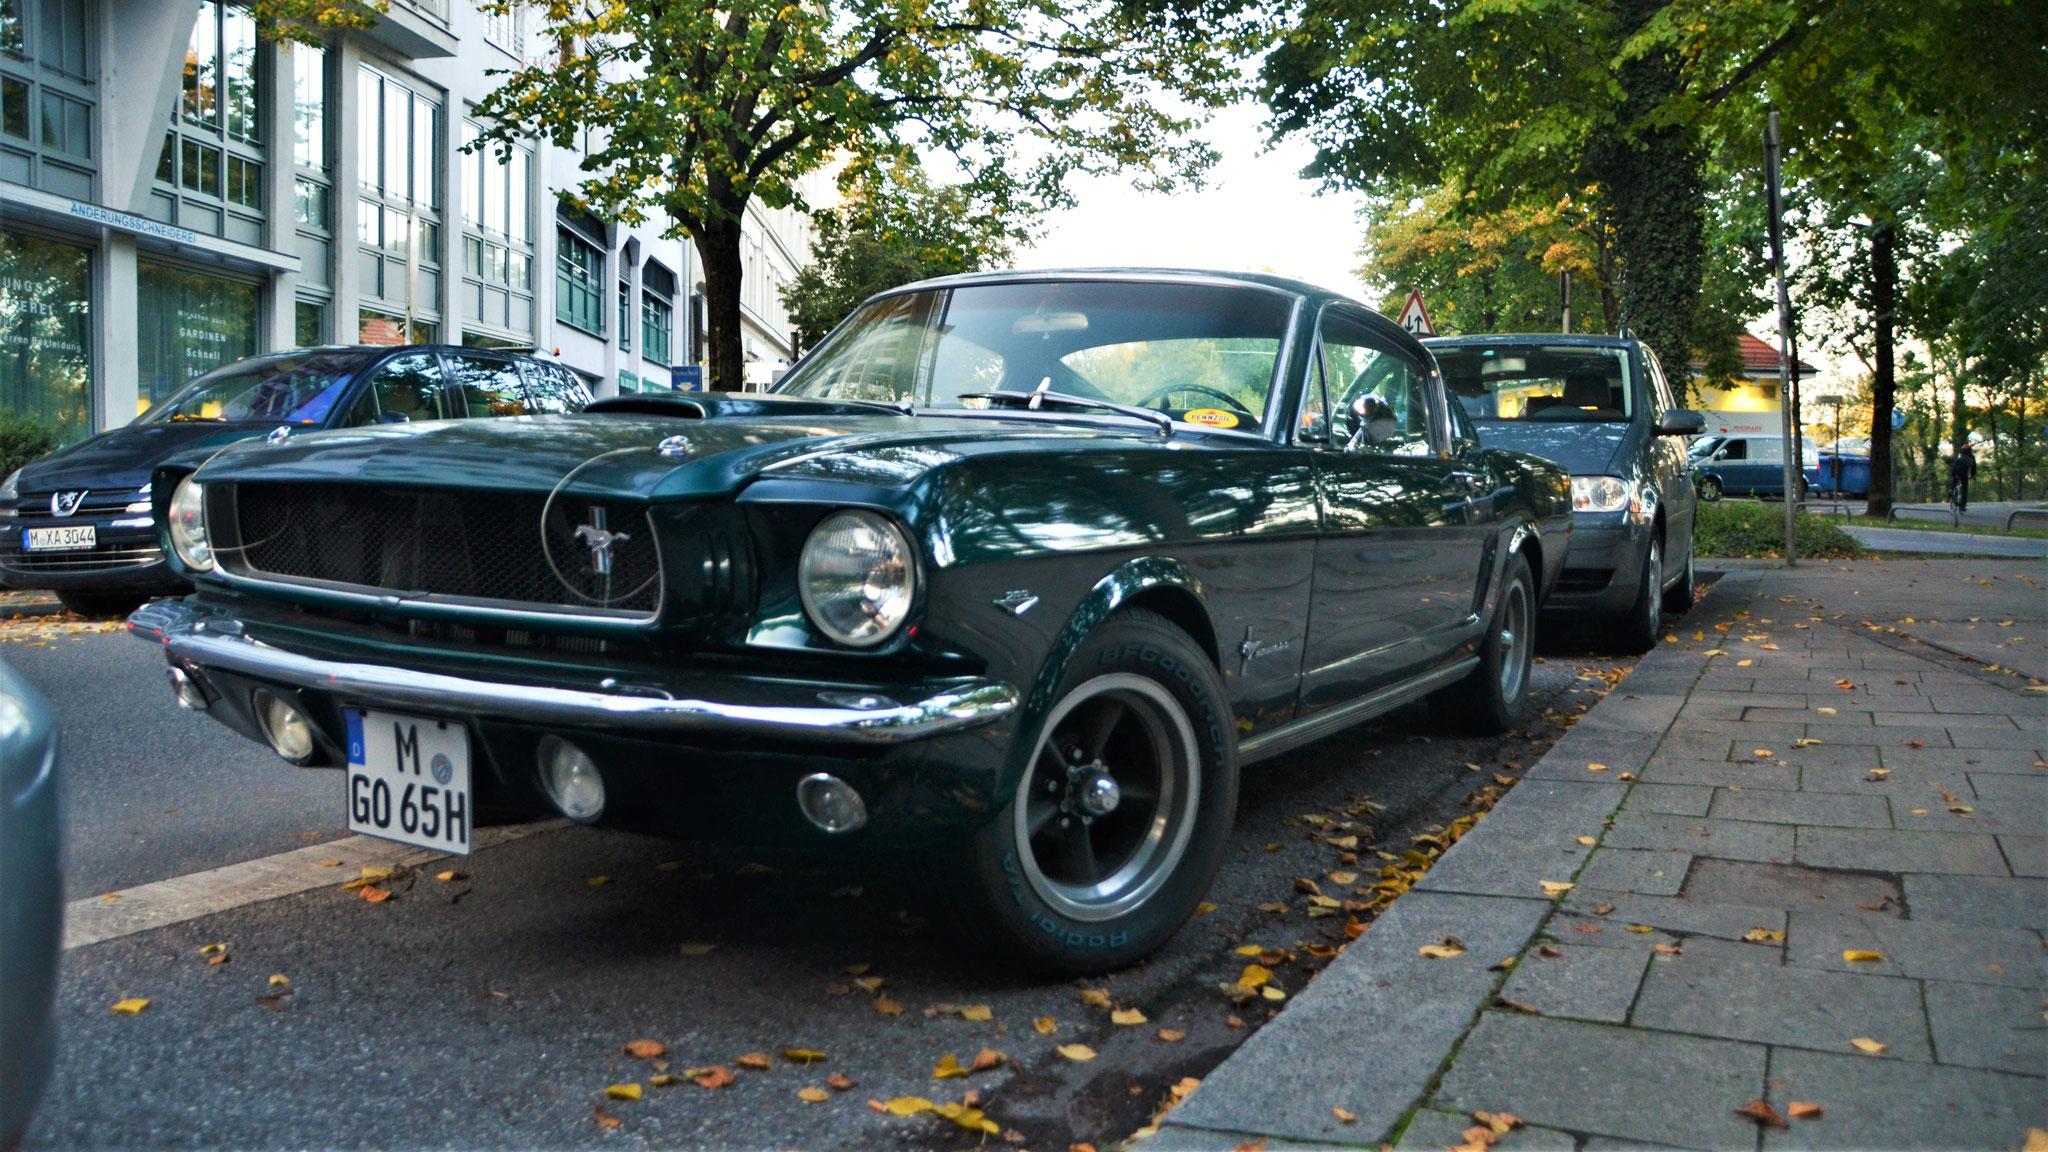 Mustang I - M-GO-65H